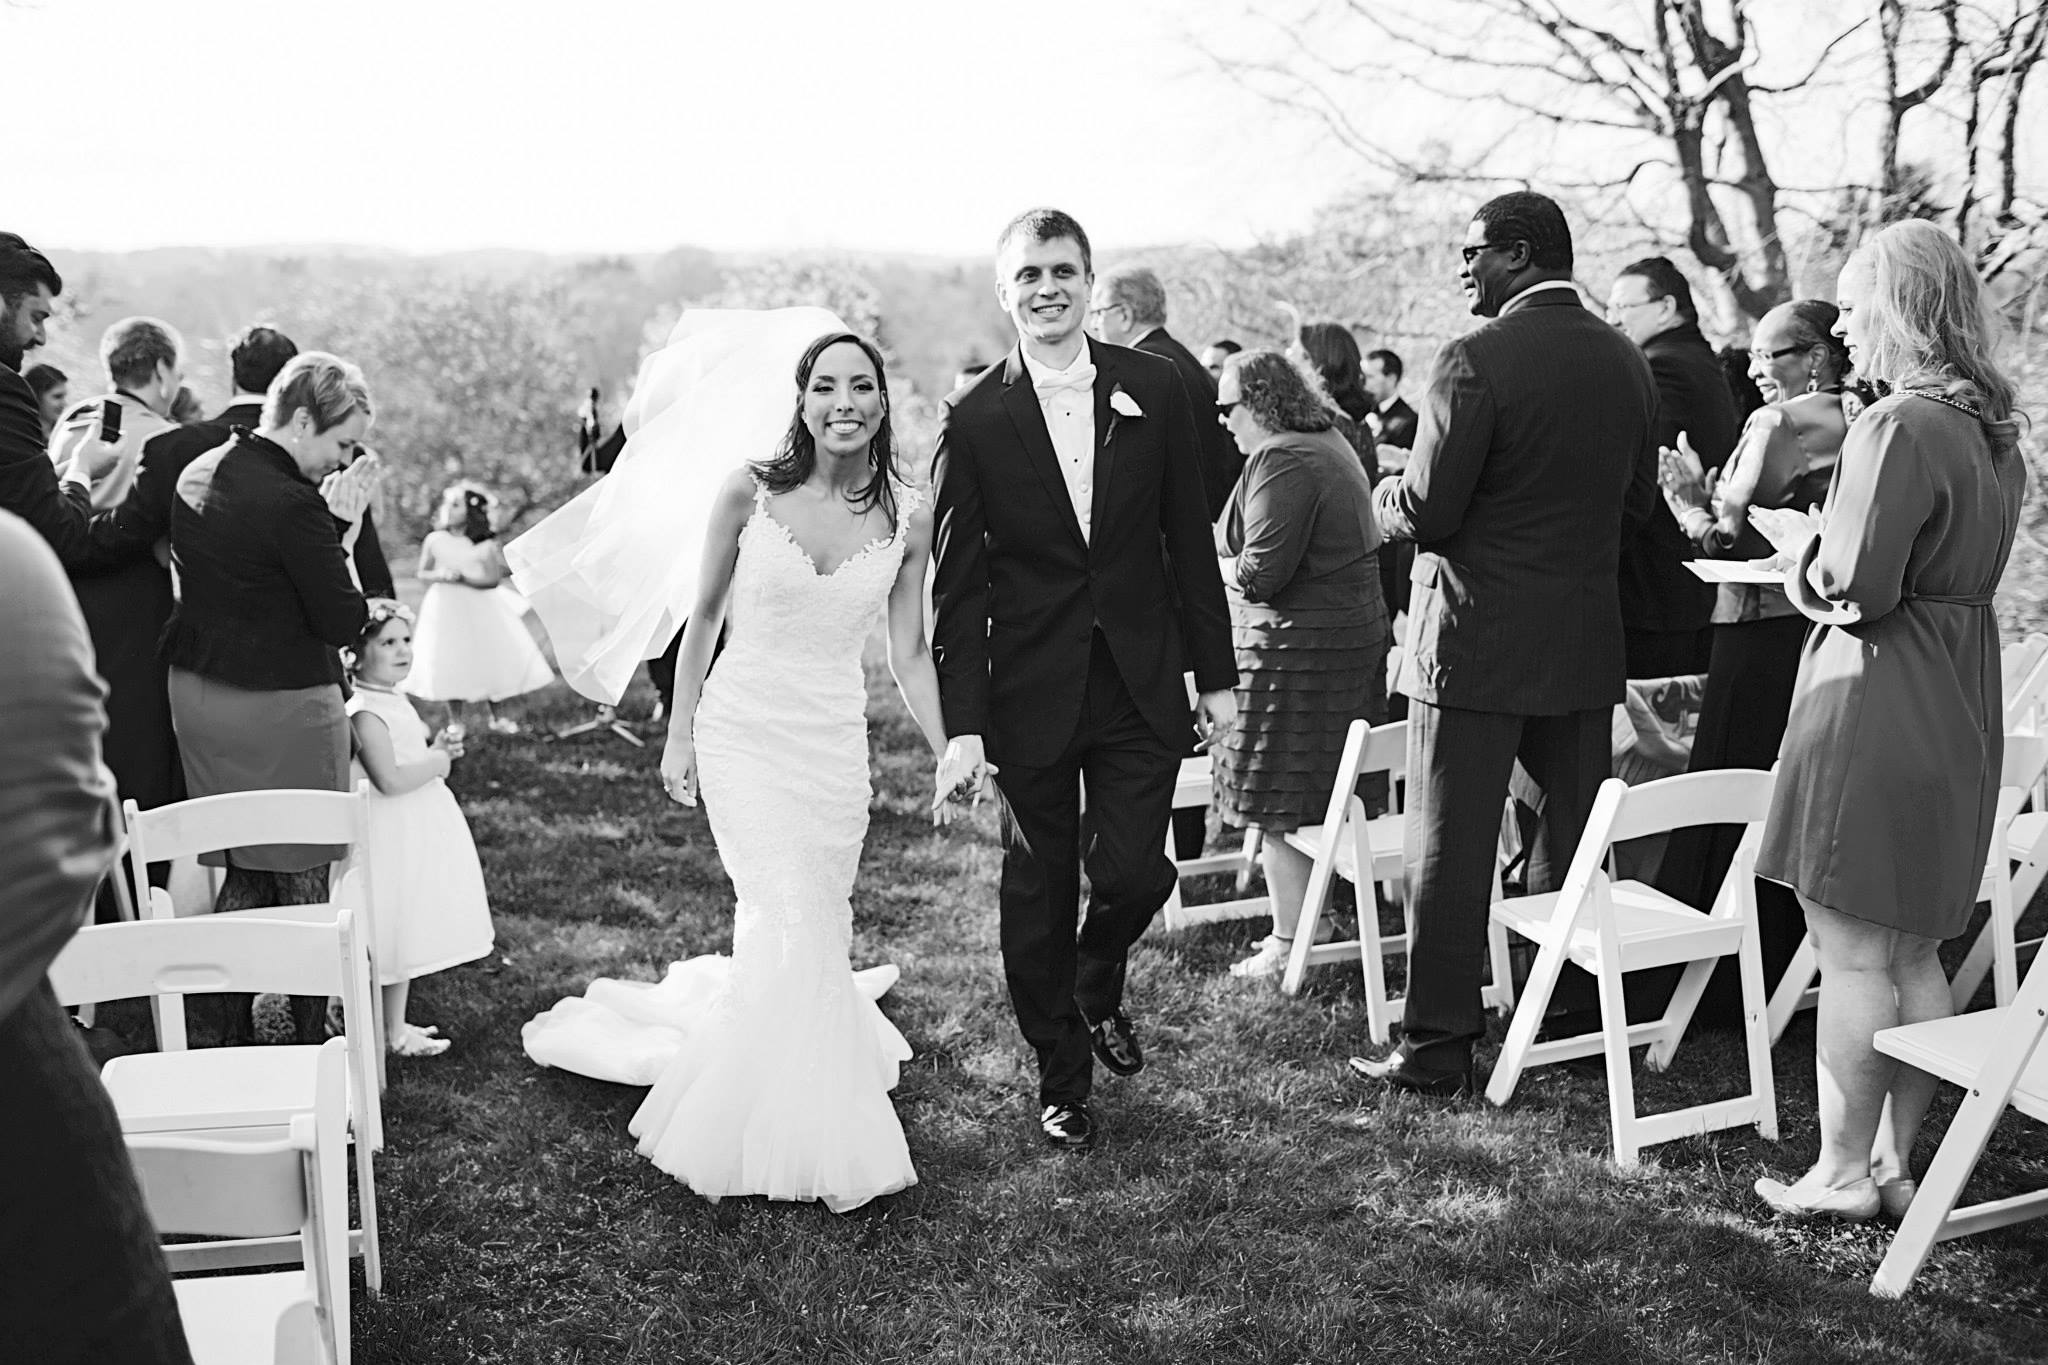 Jeff Frandsen Wedding Photography